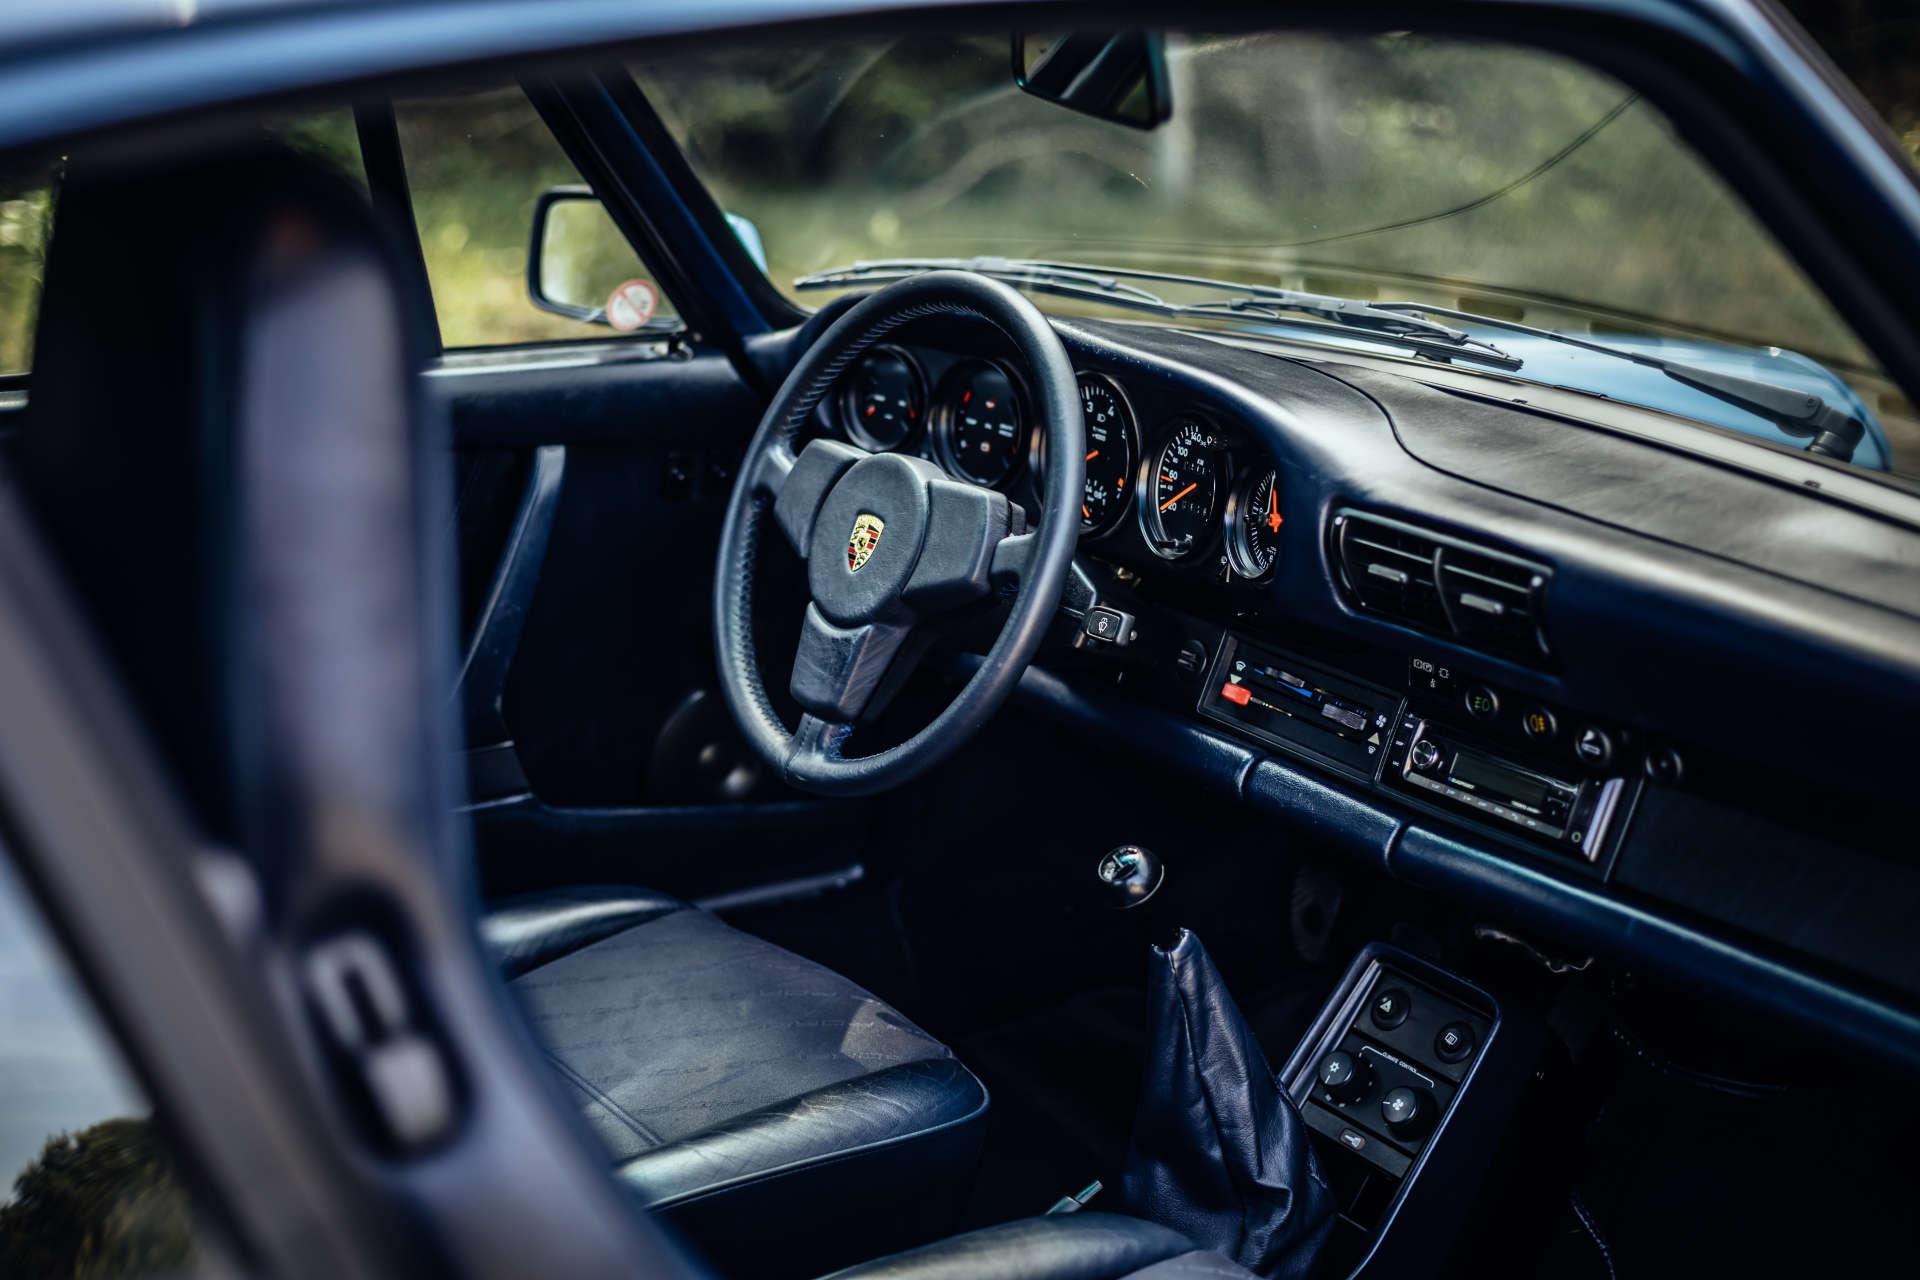 Porsche 911 Turbo 3.3 - Innenraum